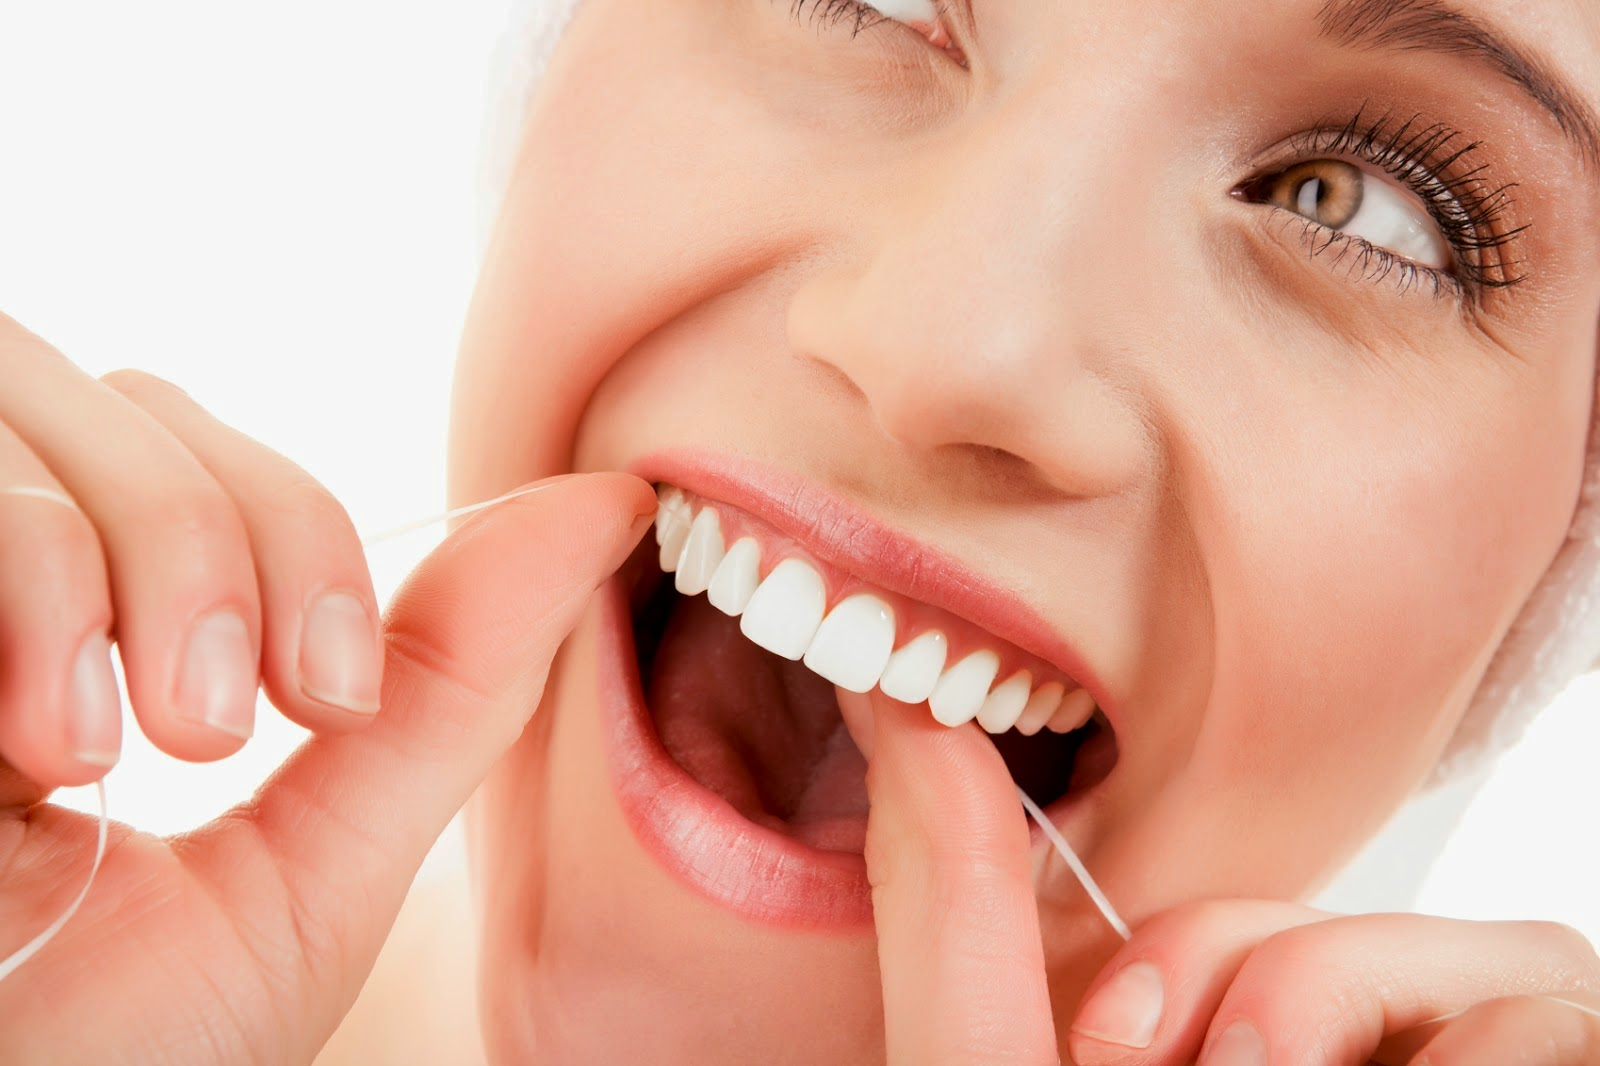 dental health, health plan to avoid bad breath, bad breath